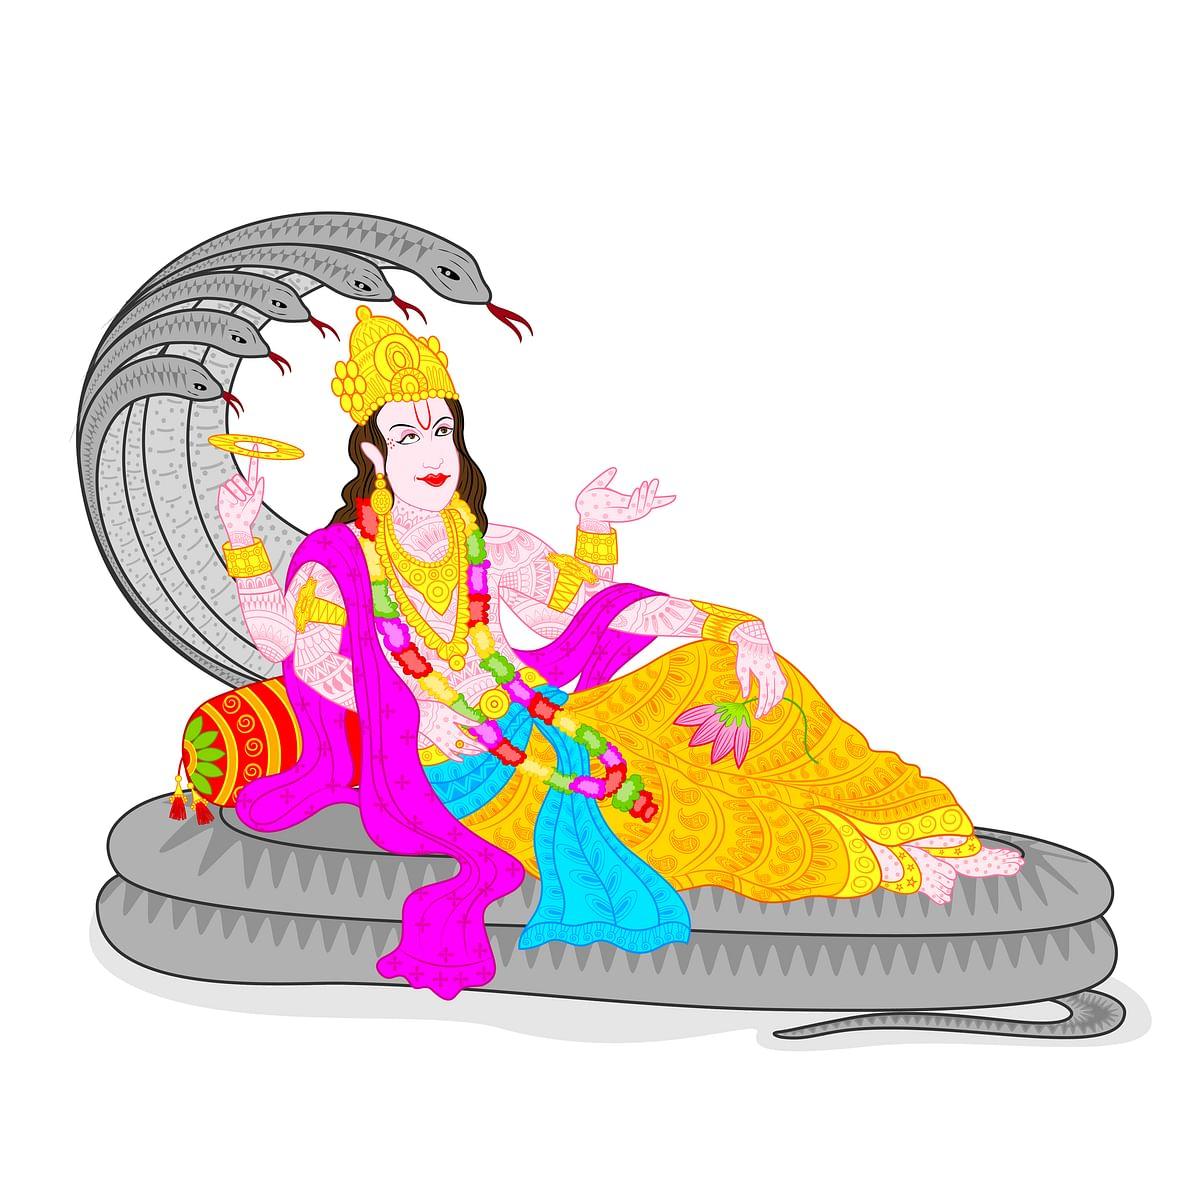 वरुथिनी एकादशी व्रत विधि- Varuthini Ekadashi Vrat Vidhi in Hindi